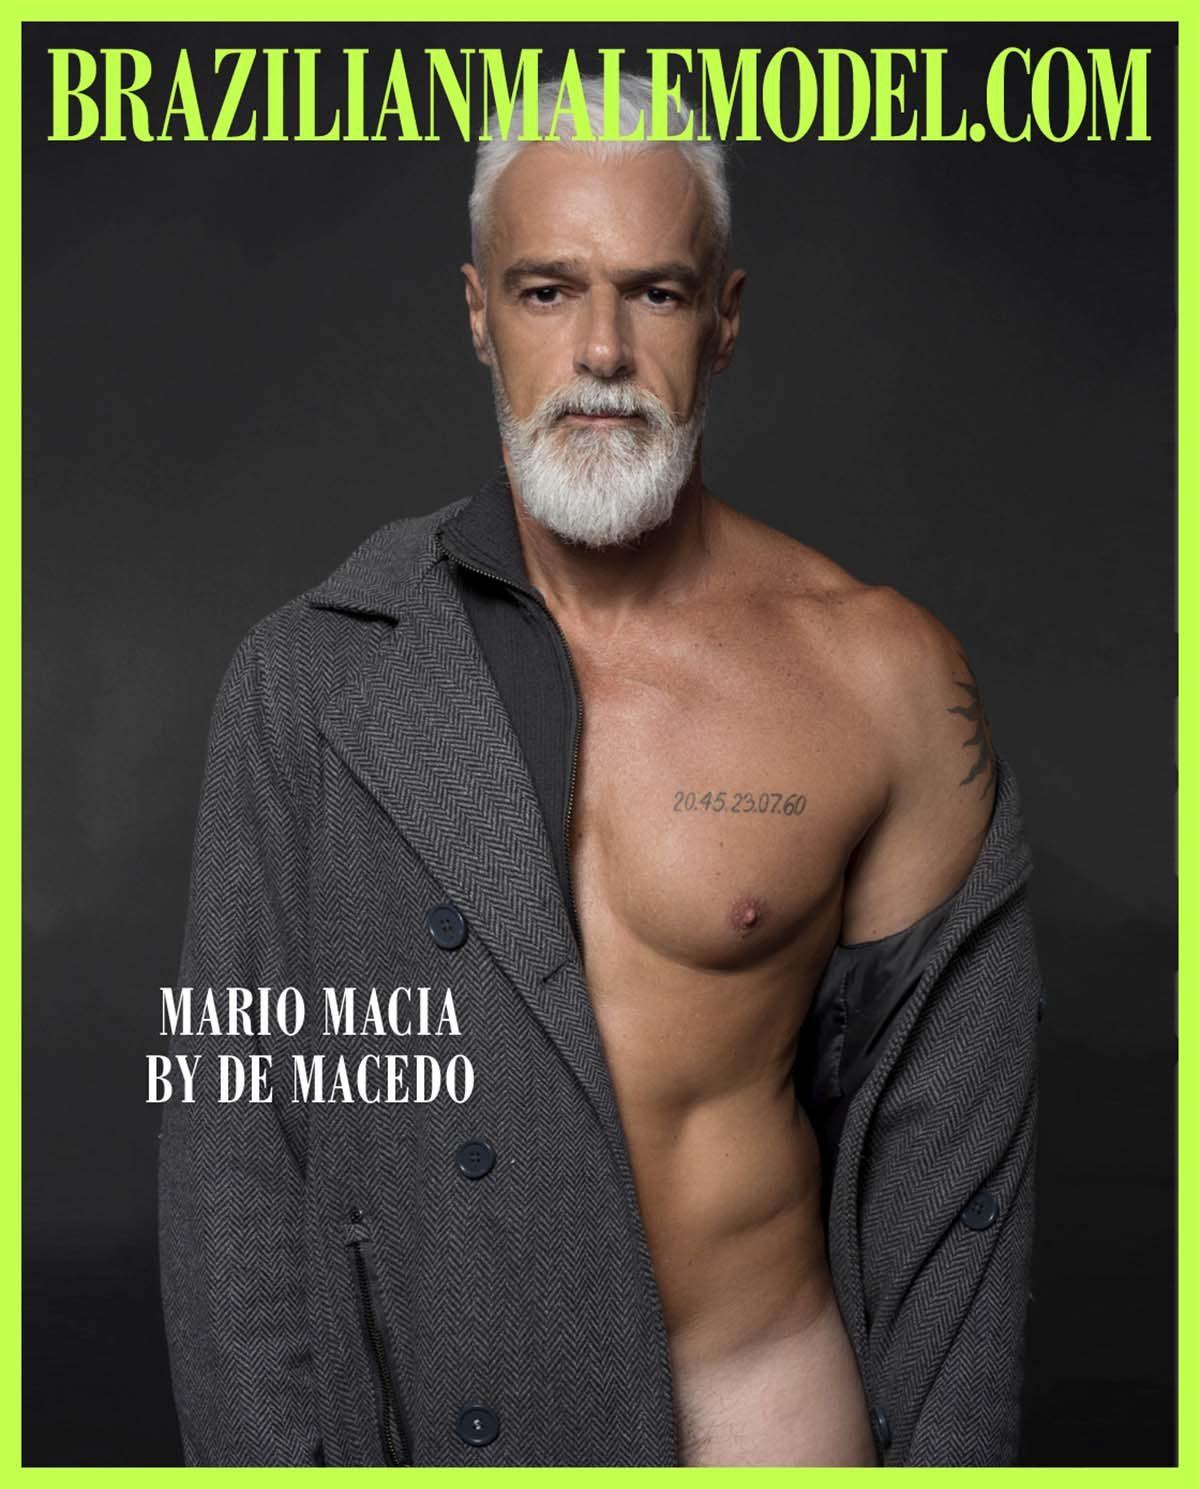 Mario Macia by De Macedo